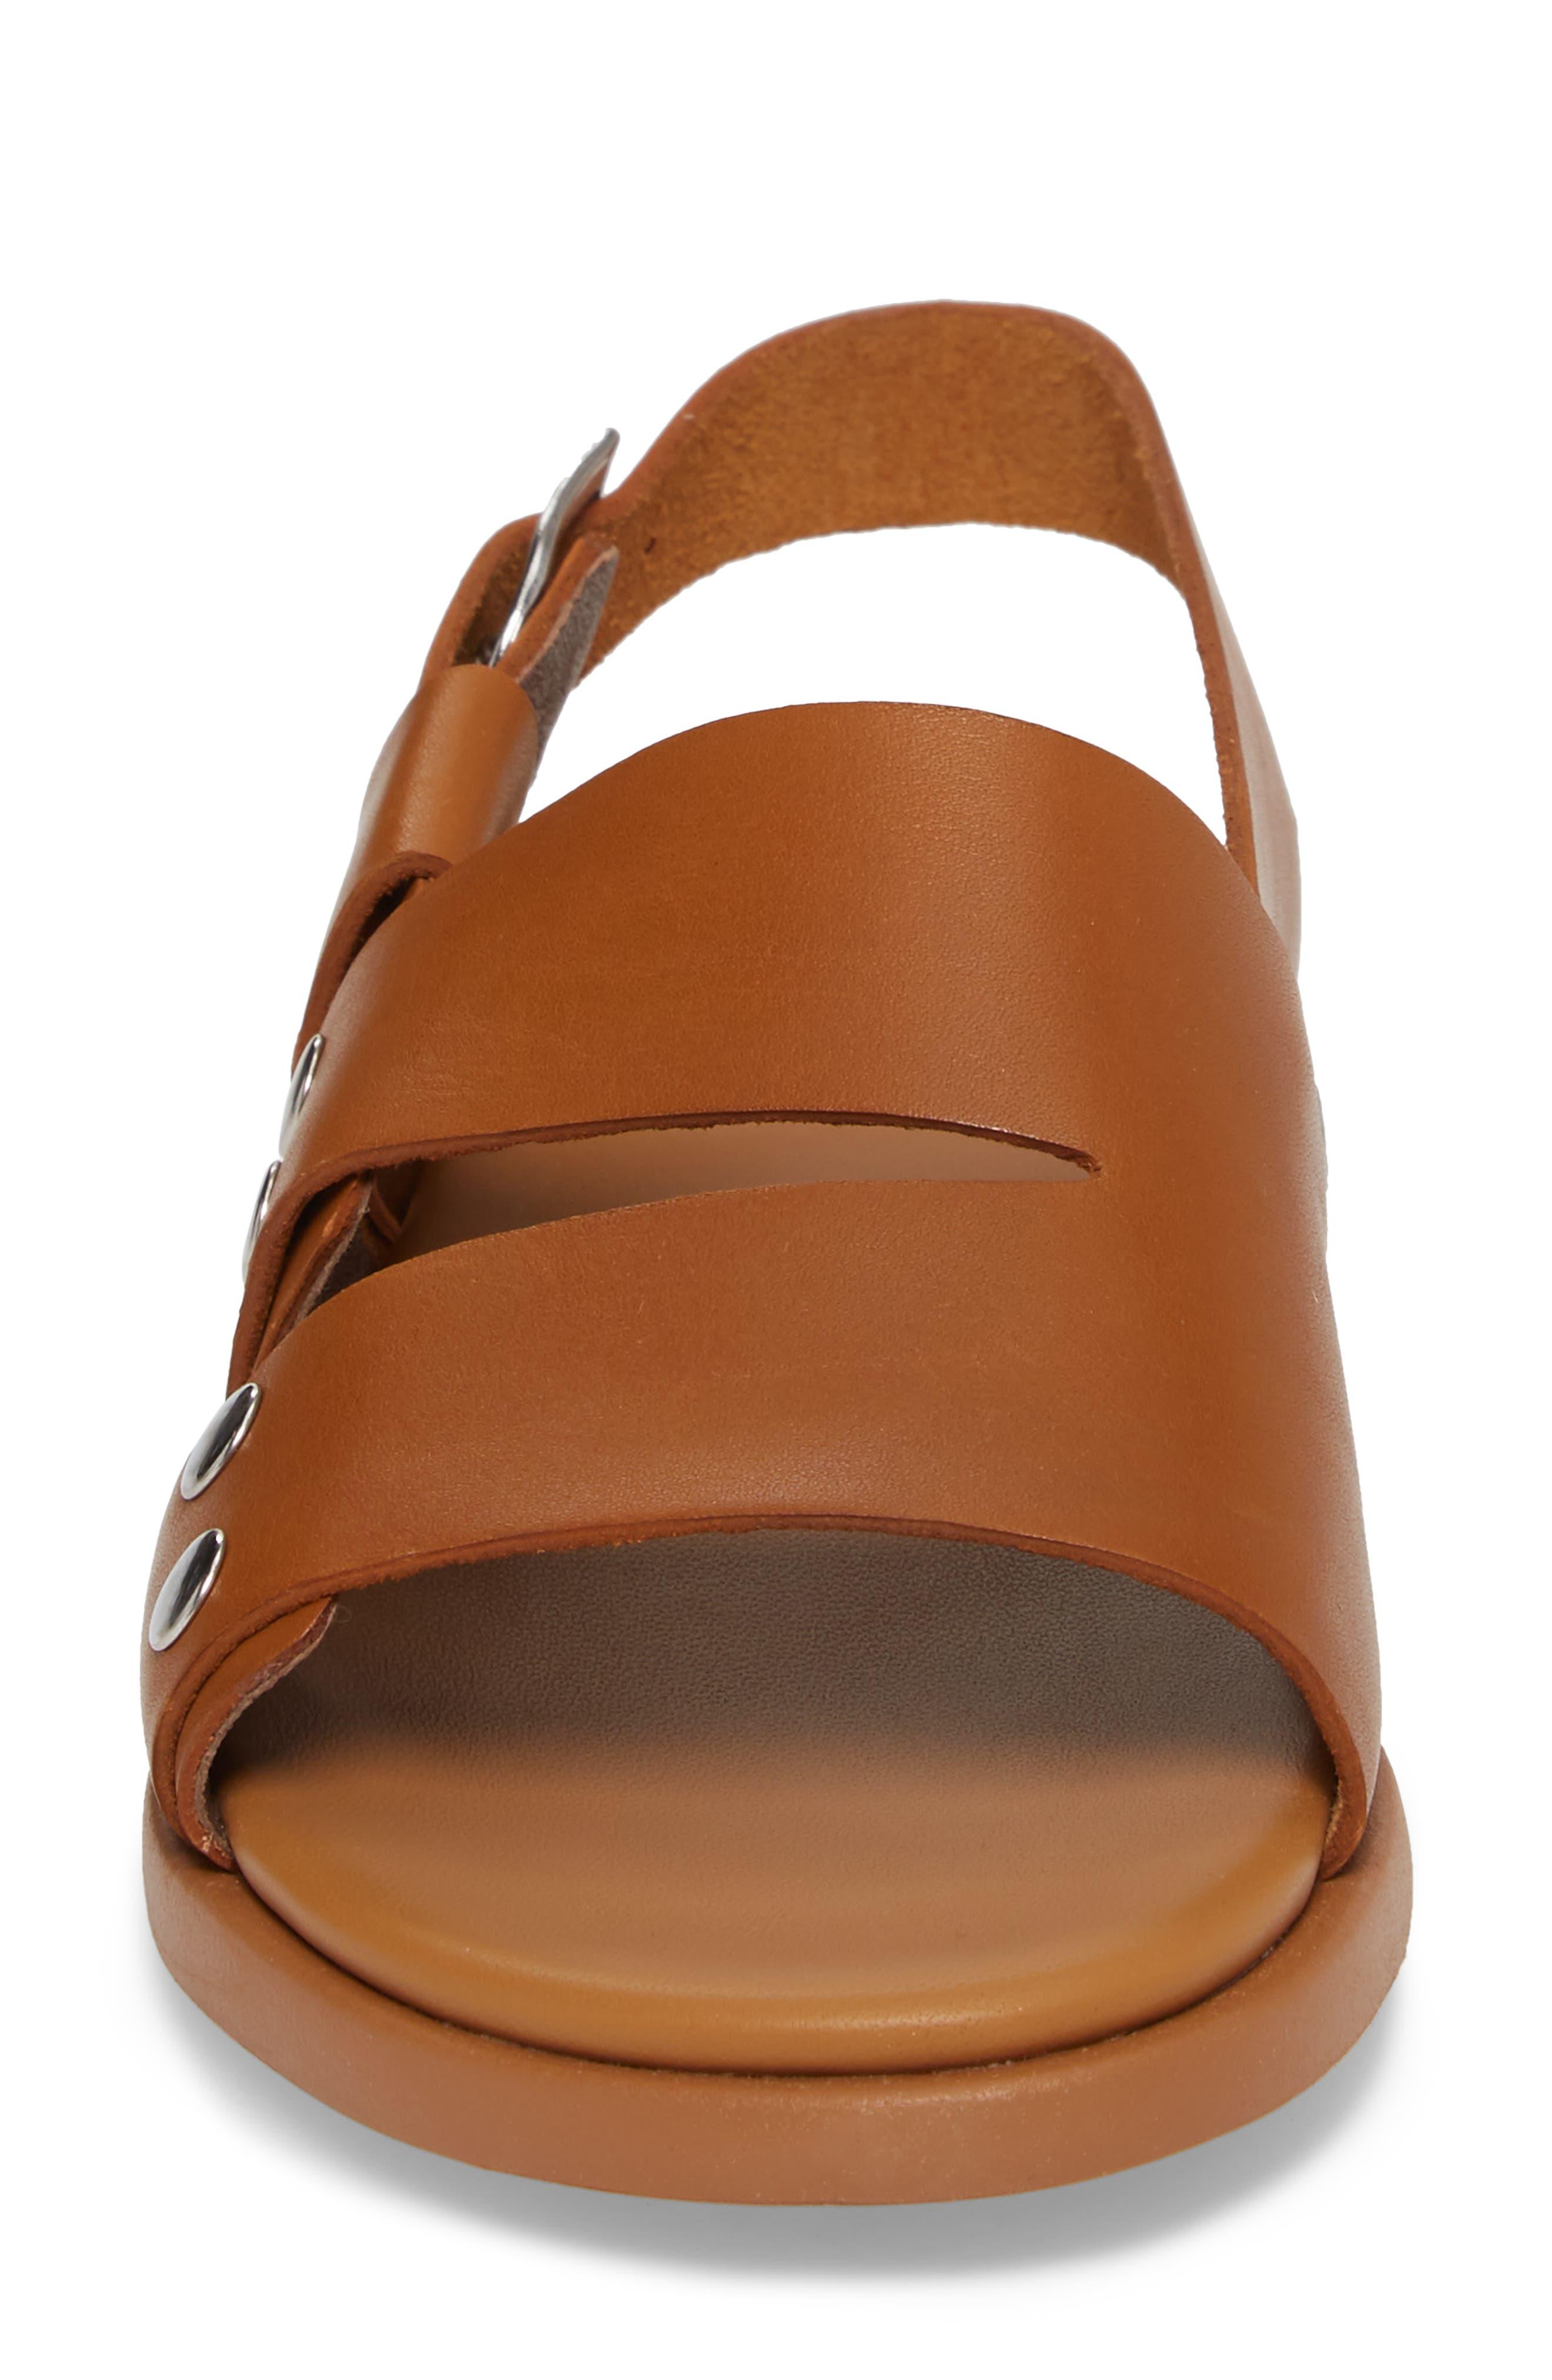 Edy Slingback Sandal,                             Alternate thumbnail 4, color,                             Rust/ Copper Leather